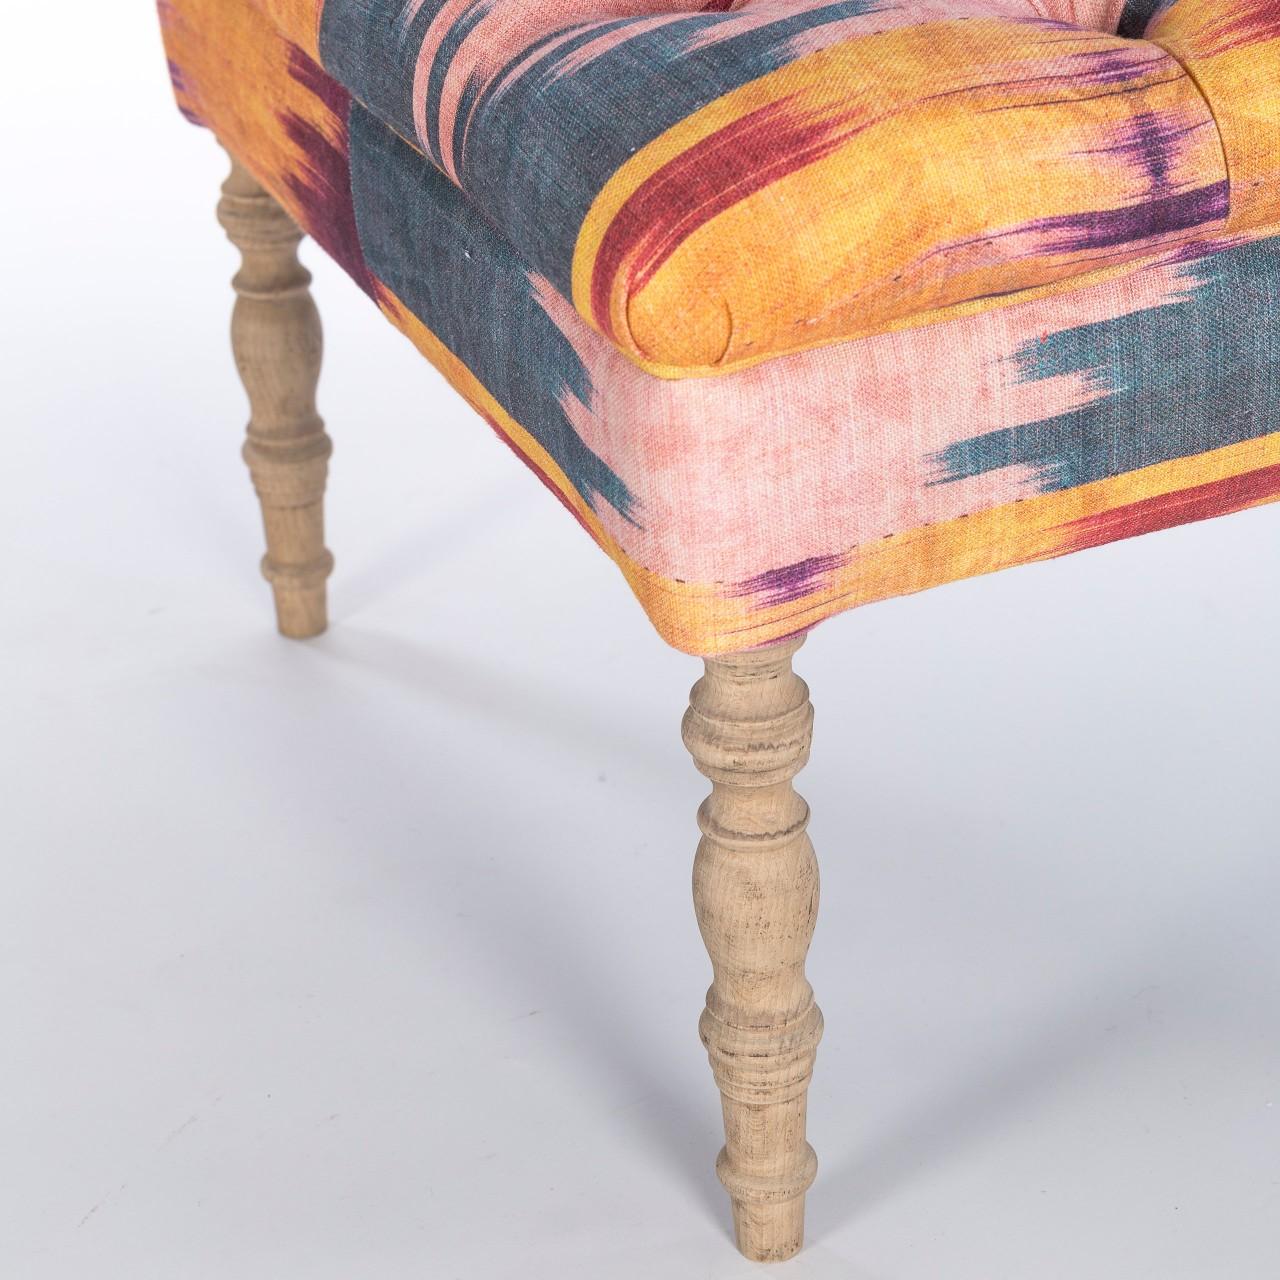 DUBOIS Tufted Ottoman - PATOLA Linen